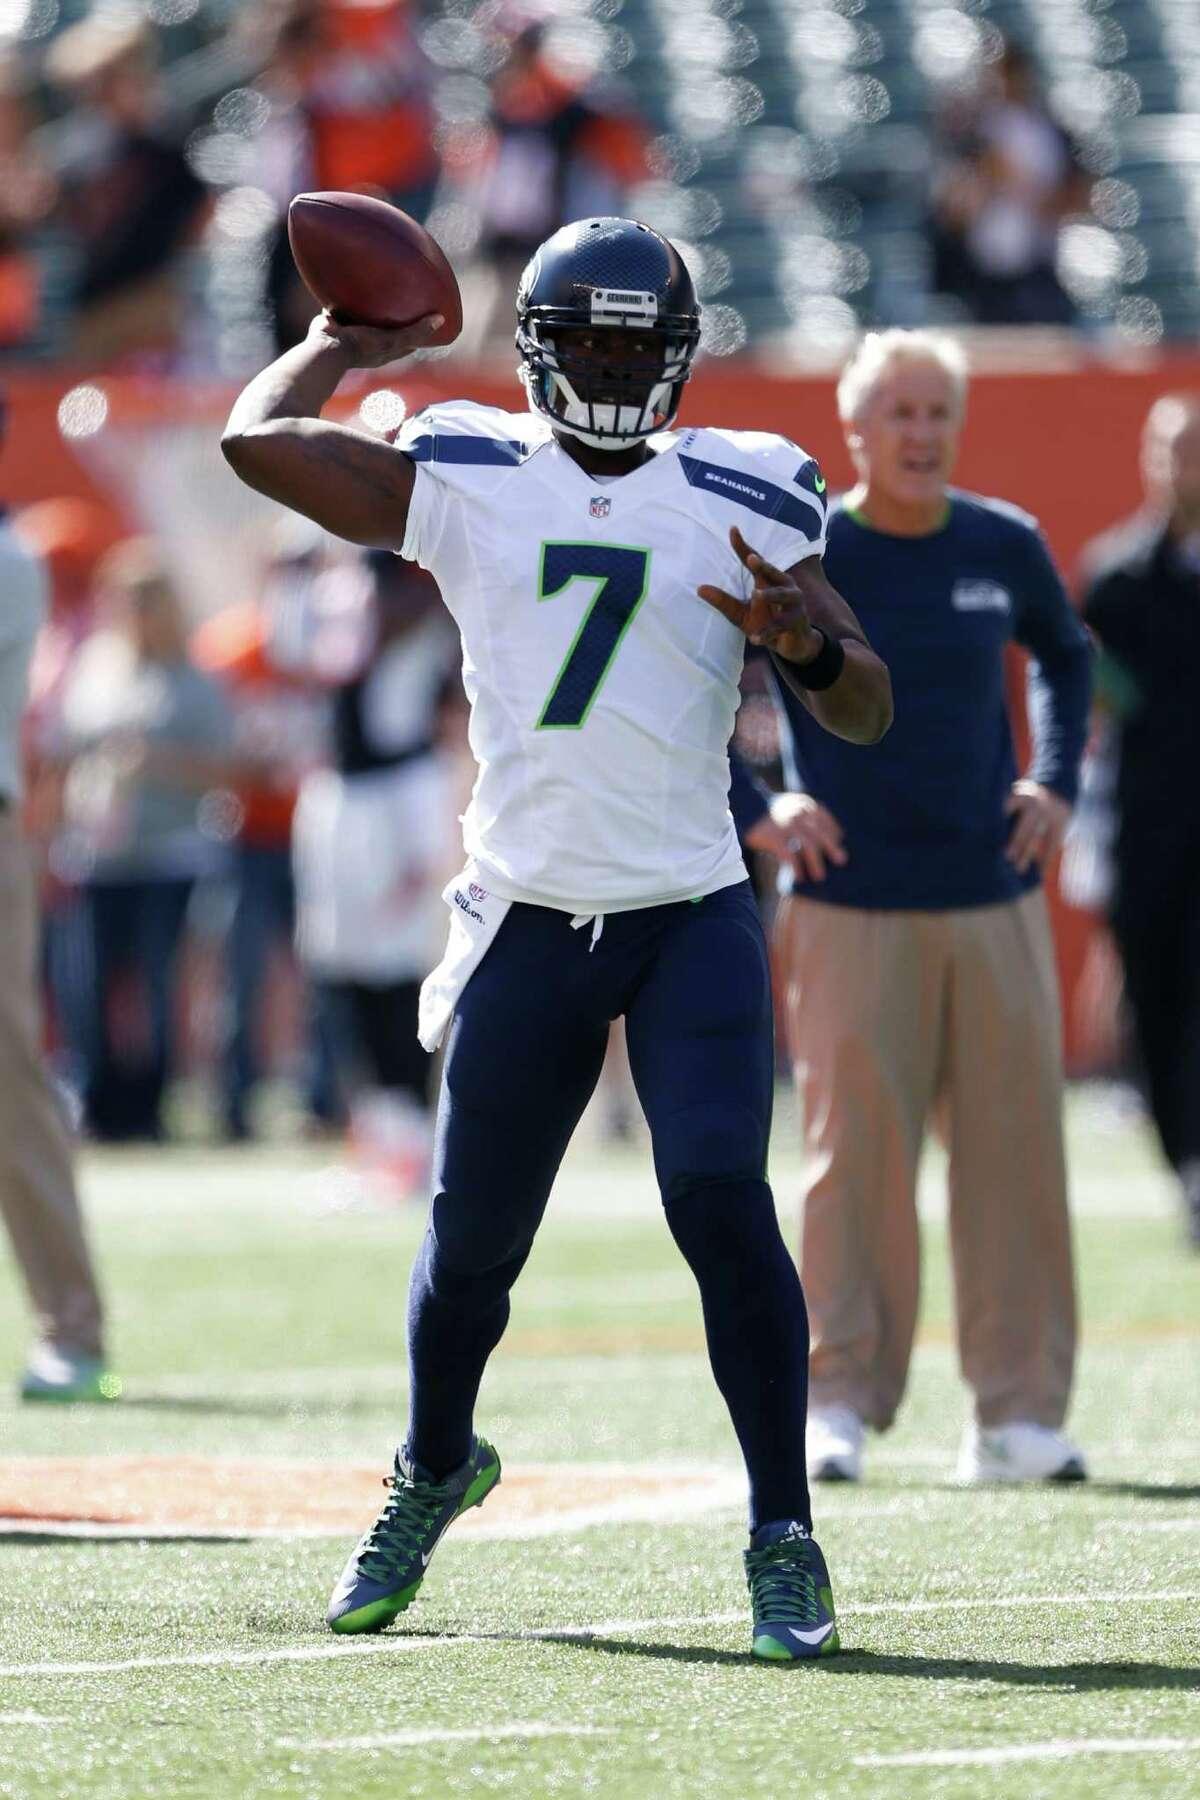 Seattle Seahawks quarterback Tarvaris Jackson throws during practice before an NFL football game against the Cincinnati Bengals, Sunday, Oct. 11, 2015, in Cincinnati. (AP Photo/Gary Landers)